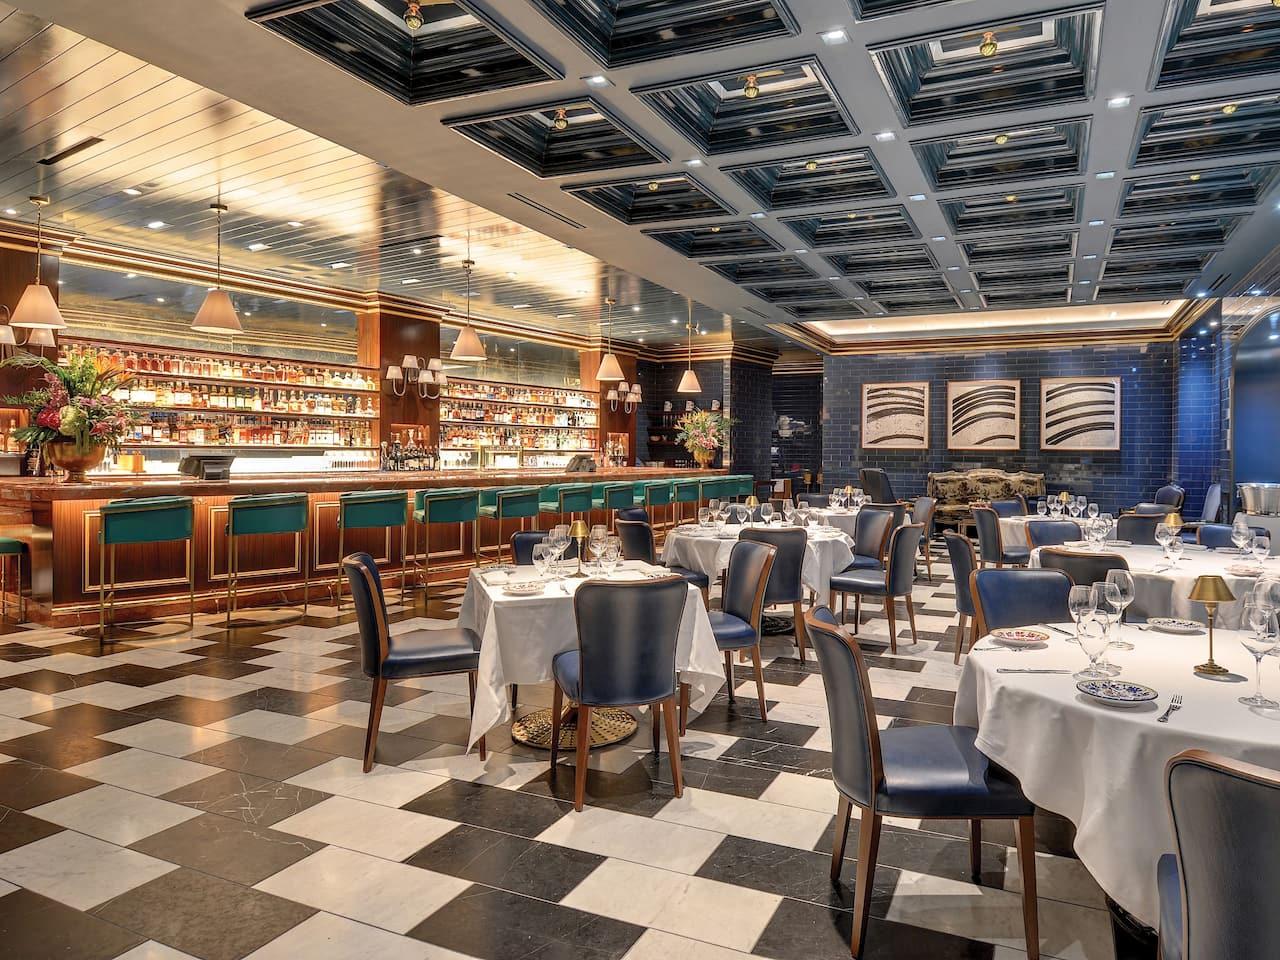 Carbone dining room